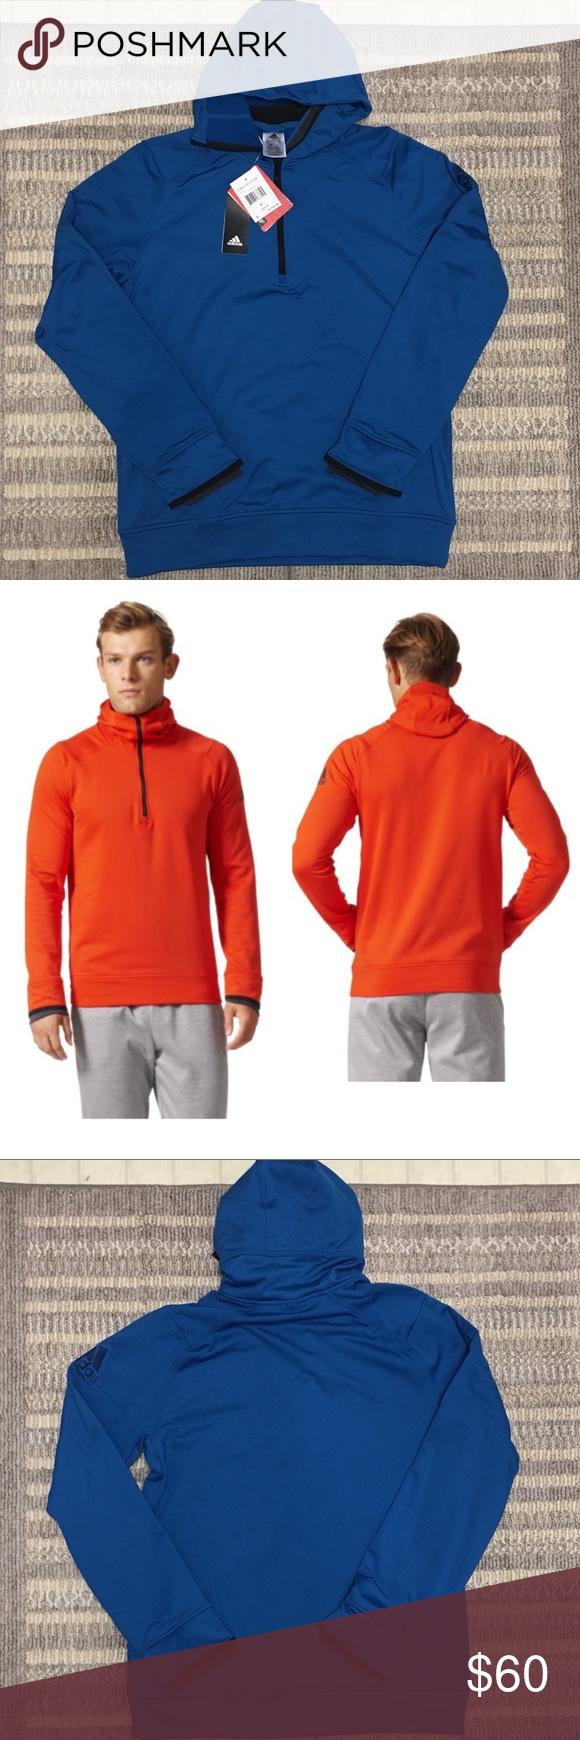 Men S Adidas Climaheat Blue Hoodie Clothes Design Fashion Fashion Design [ 1740 x 580 Pixel ]